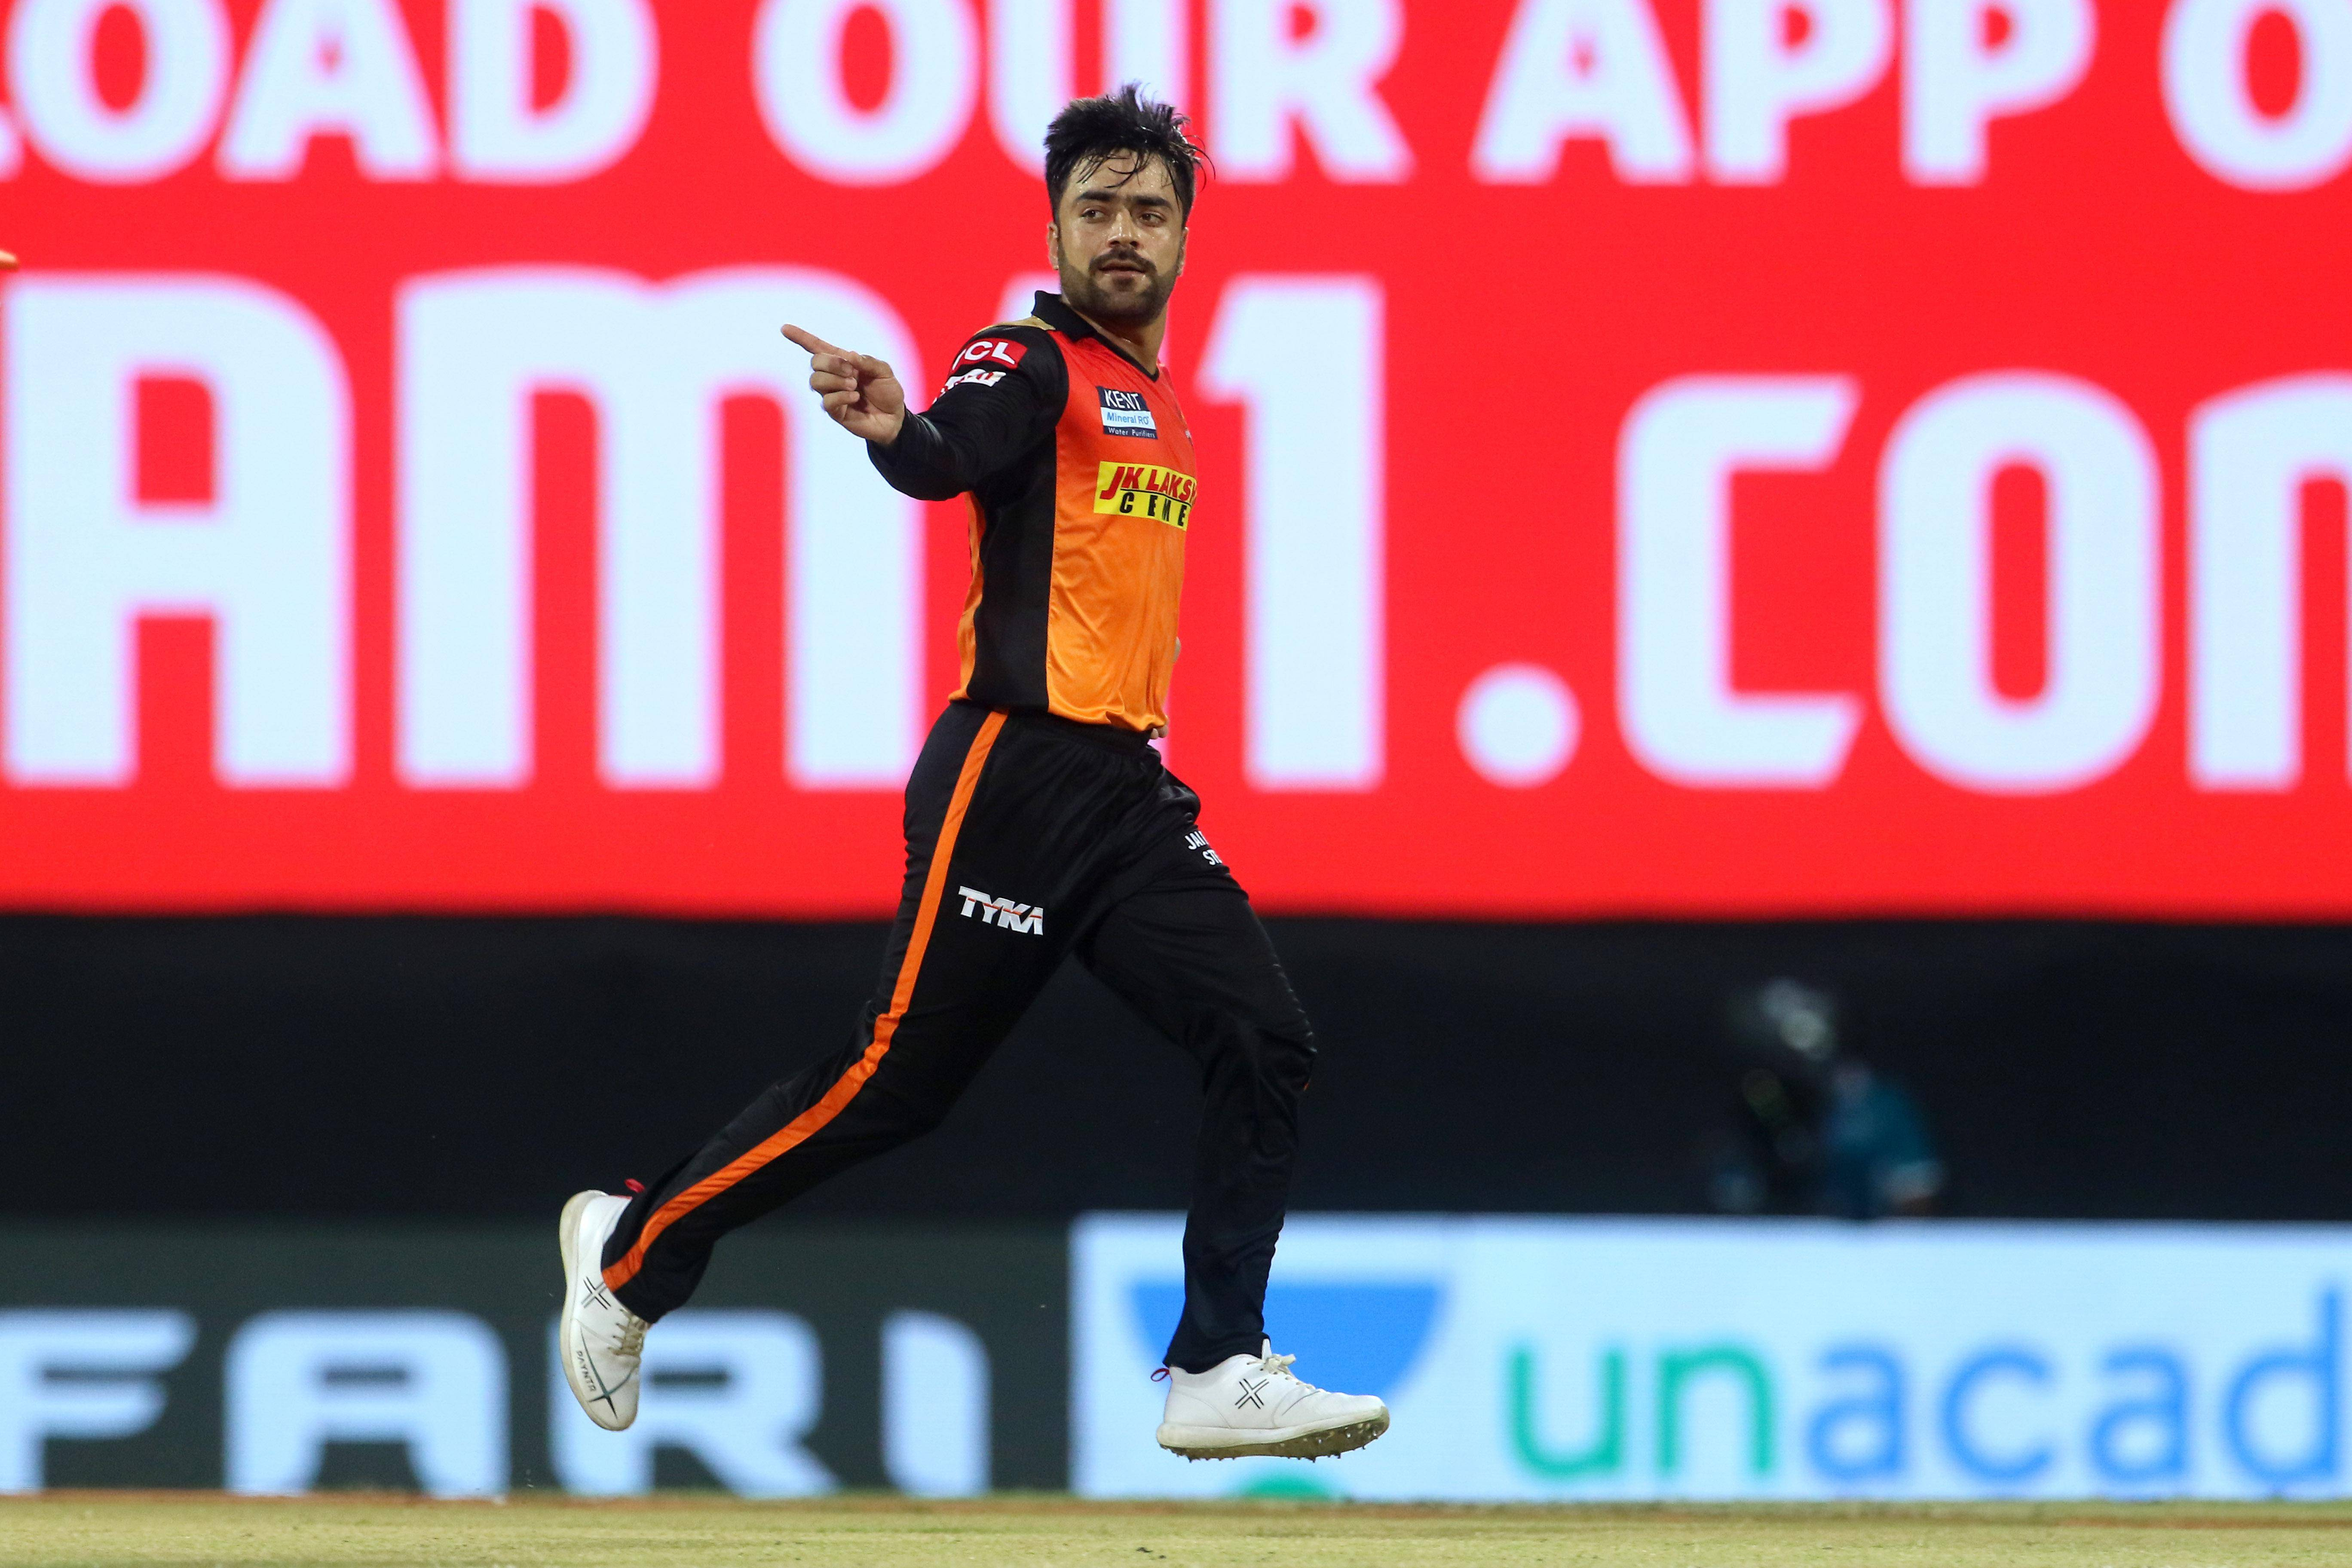 IPL 2021: Meet the top five bowlers of the season